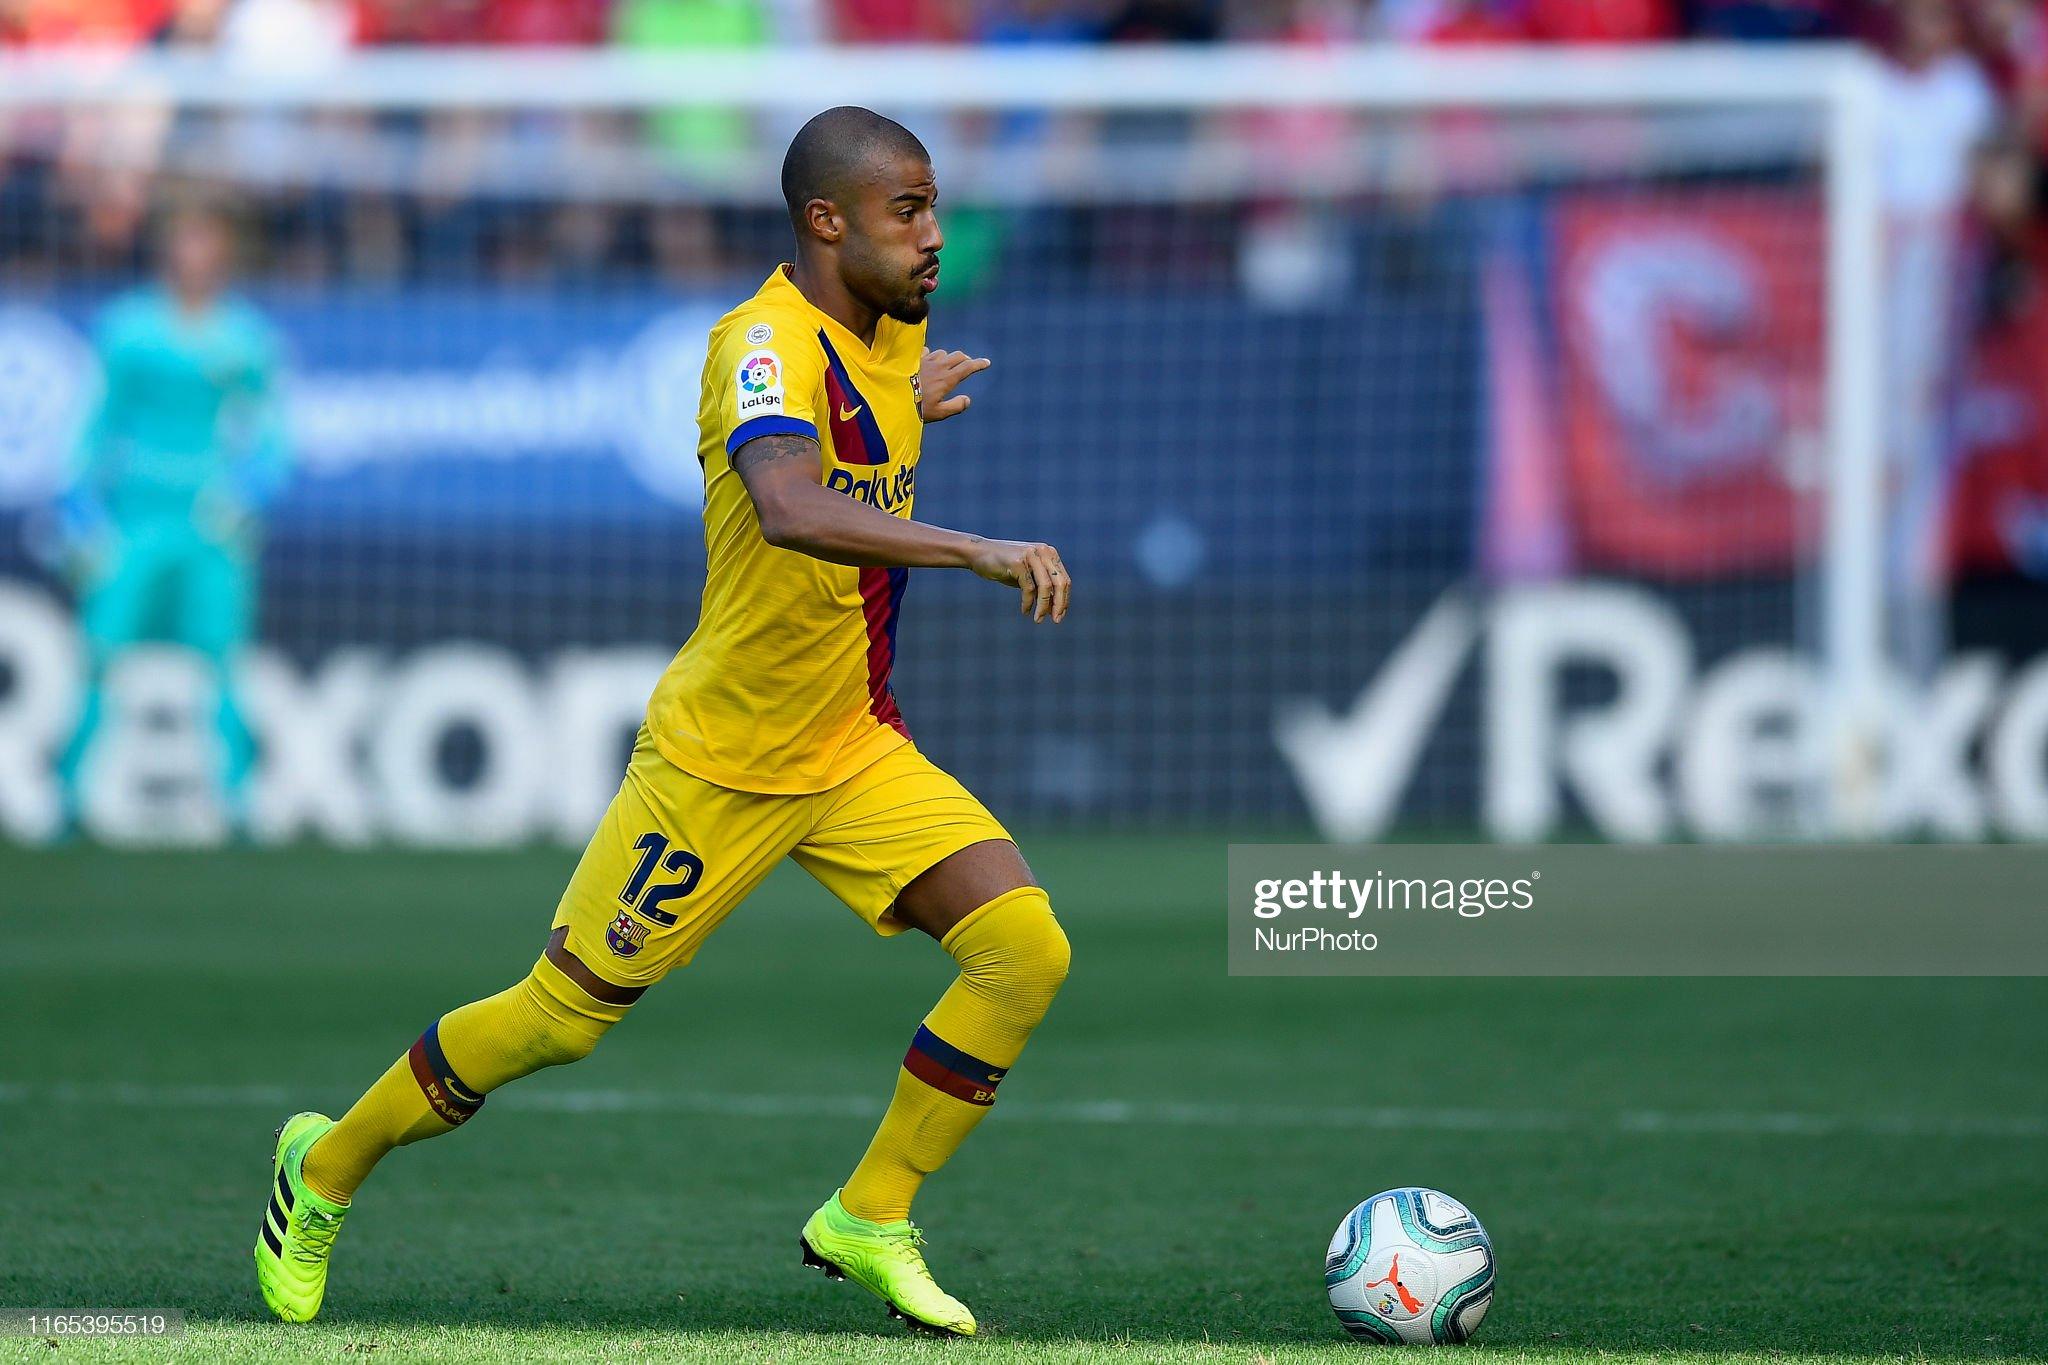 صور مباراة : أوساسونا - برشلونة 2-2 ( 31-08-2019 )  Rafinha-of-barcelona-in-action-during-the-liga-match-between-ca-and-picture-id1165395519?s=2048x2048